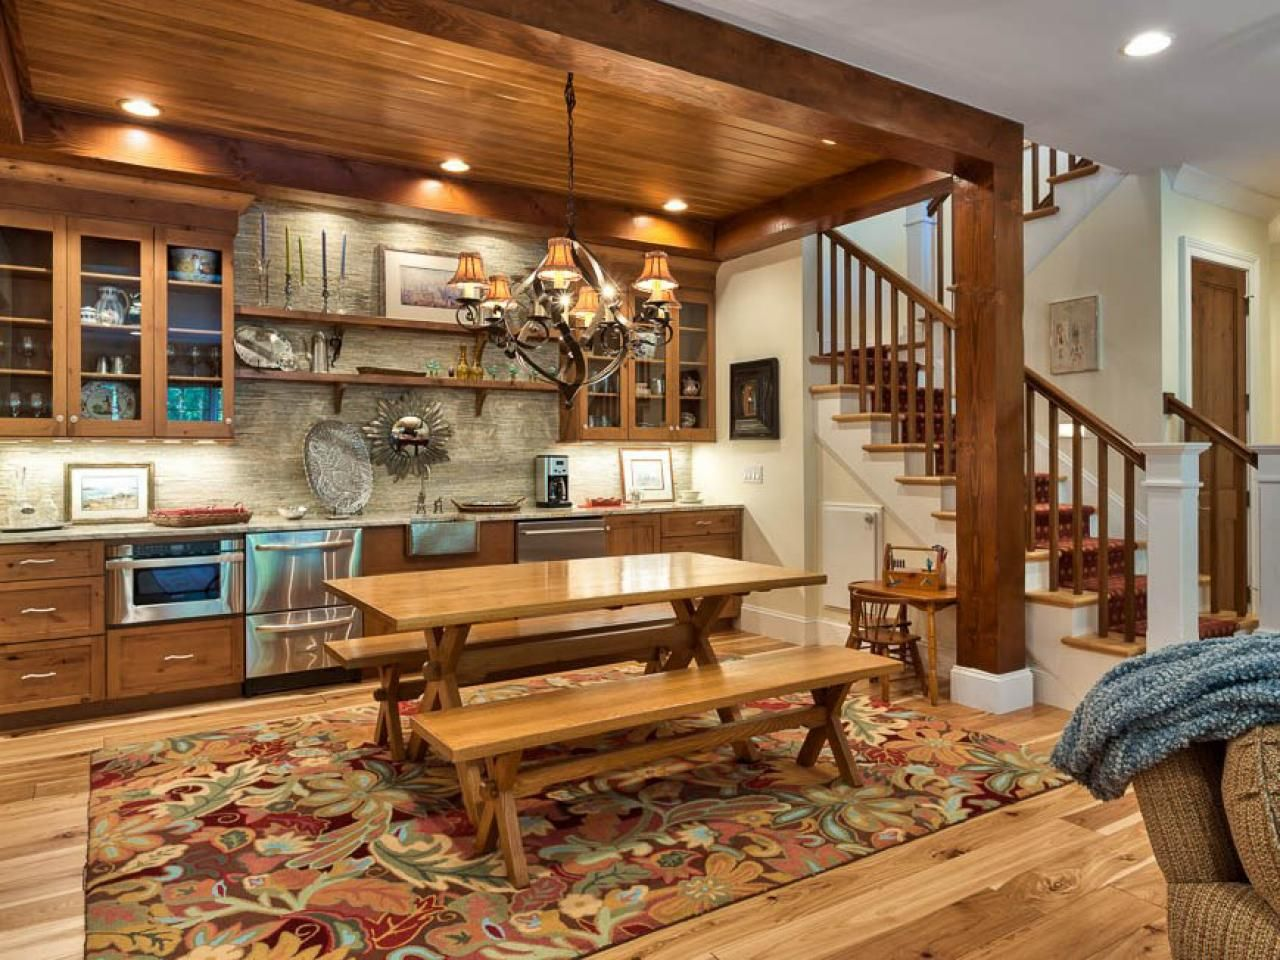 Best Pictures Of Small Kitchen Design Ideas From Hgtv Kitchen 400 x 300